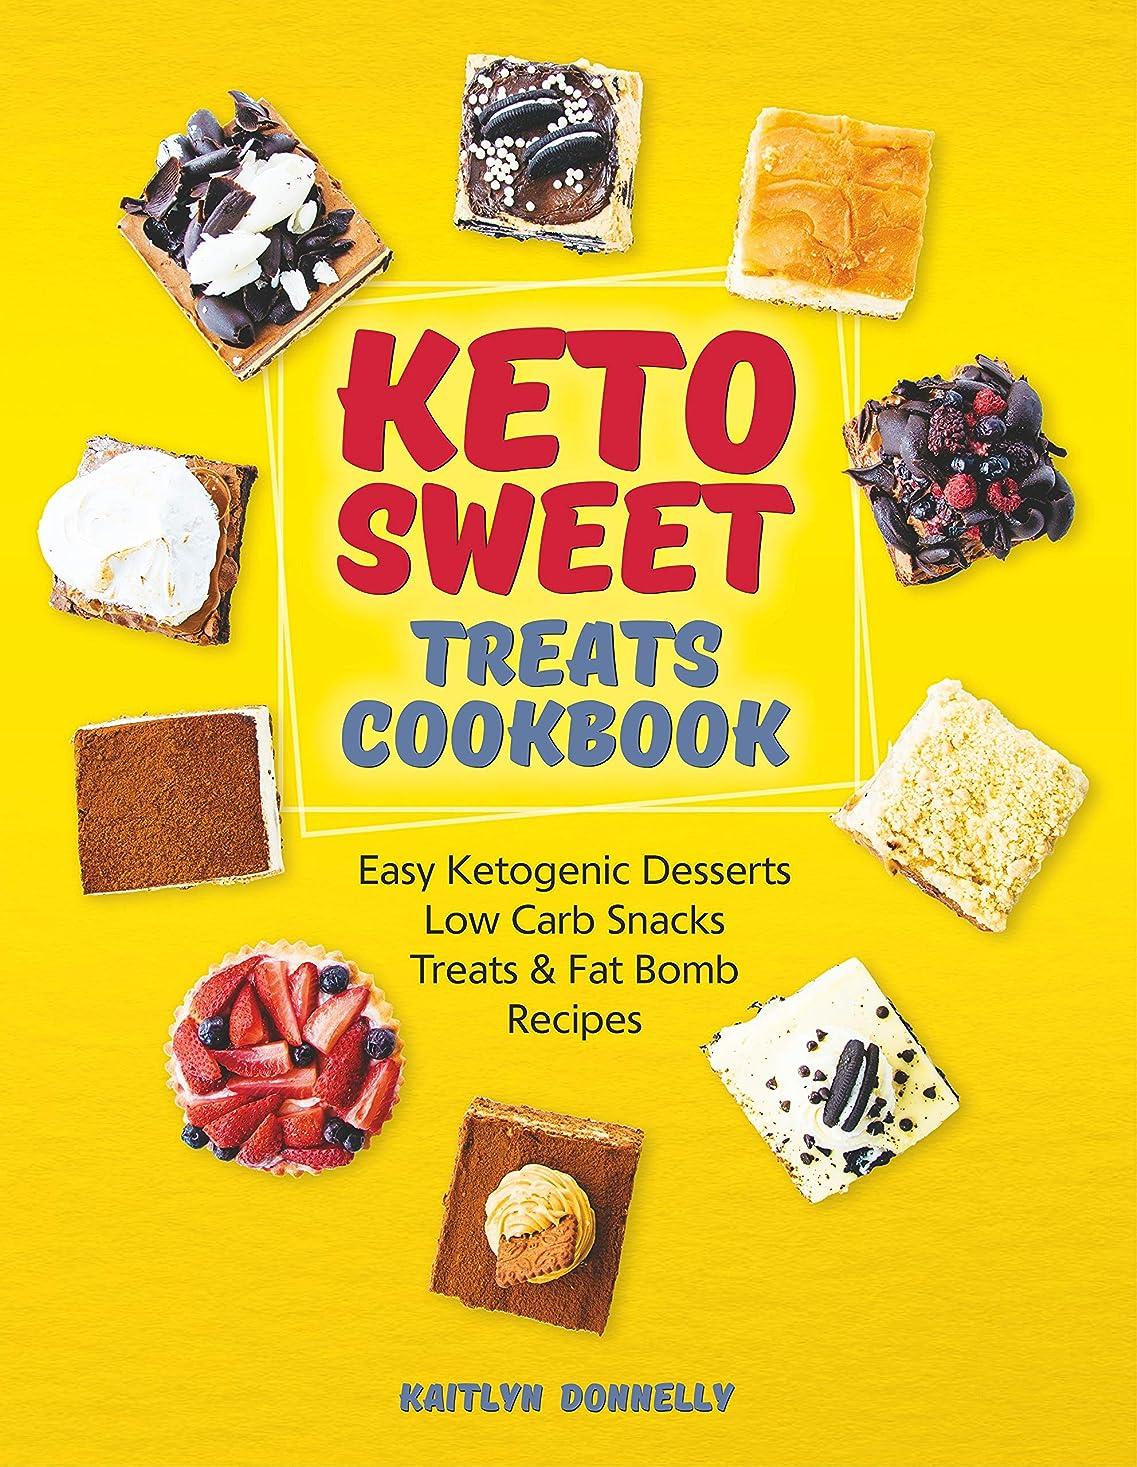 Keto Sweet Treats Cookbook: Easy Ketogenic Desserts, Low Carb Snacks, Treats & Fat Bomb Recipes (best keto dessert recipes) (English Edition)